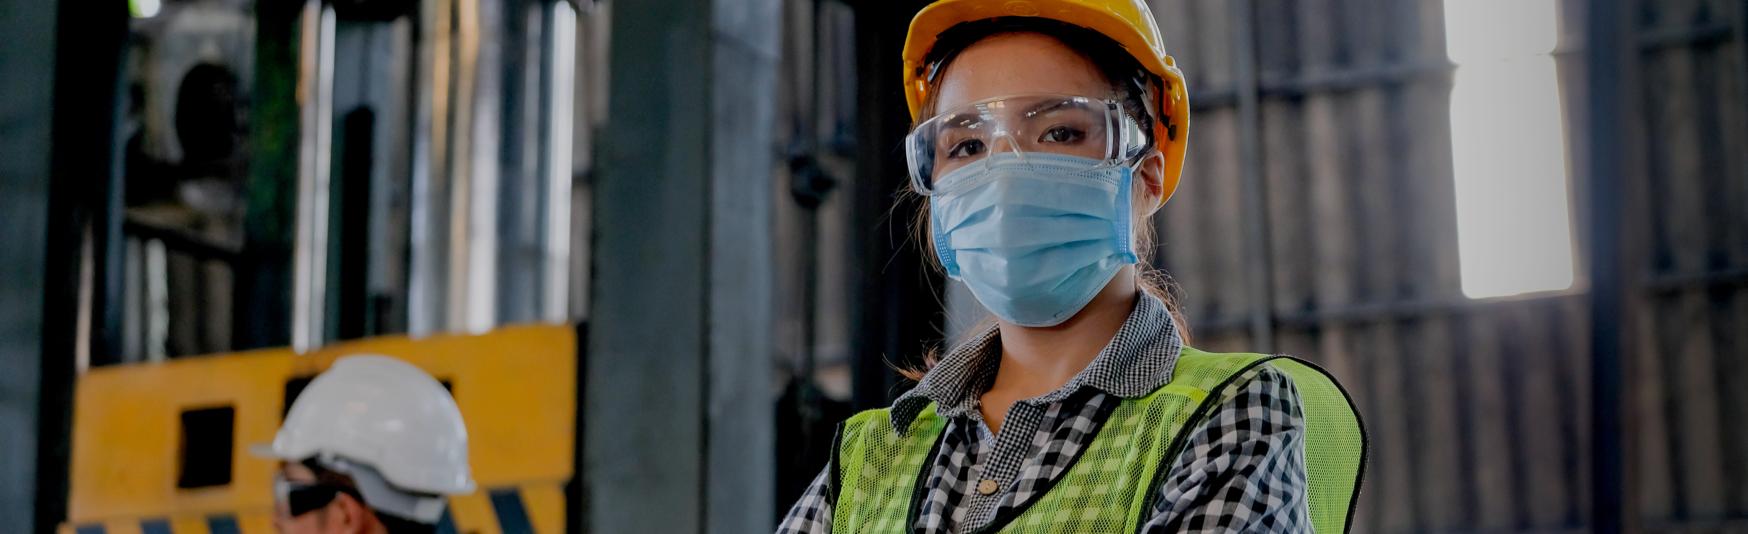 Masked Factory Worker-Hubspot Landing Page Hero-1